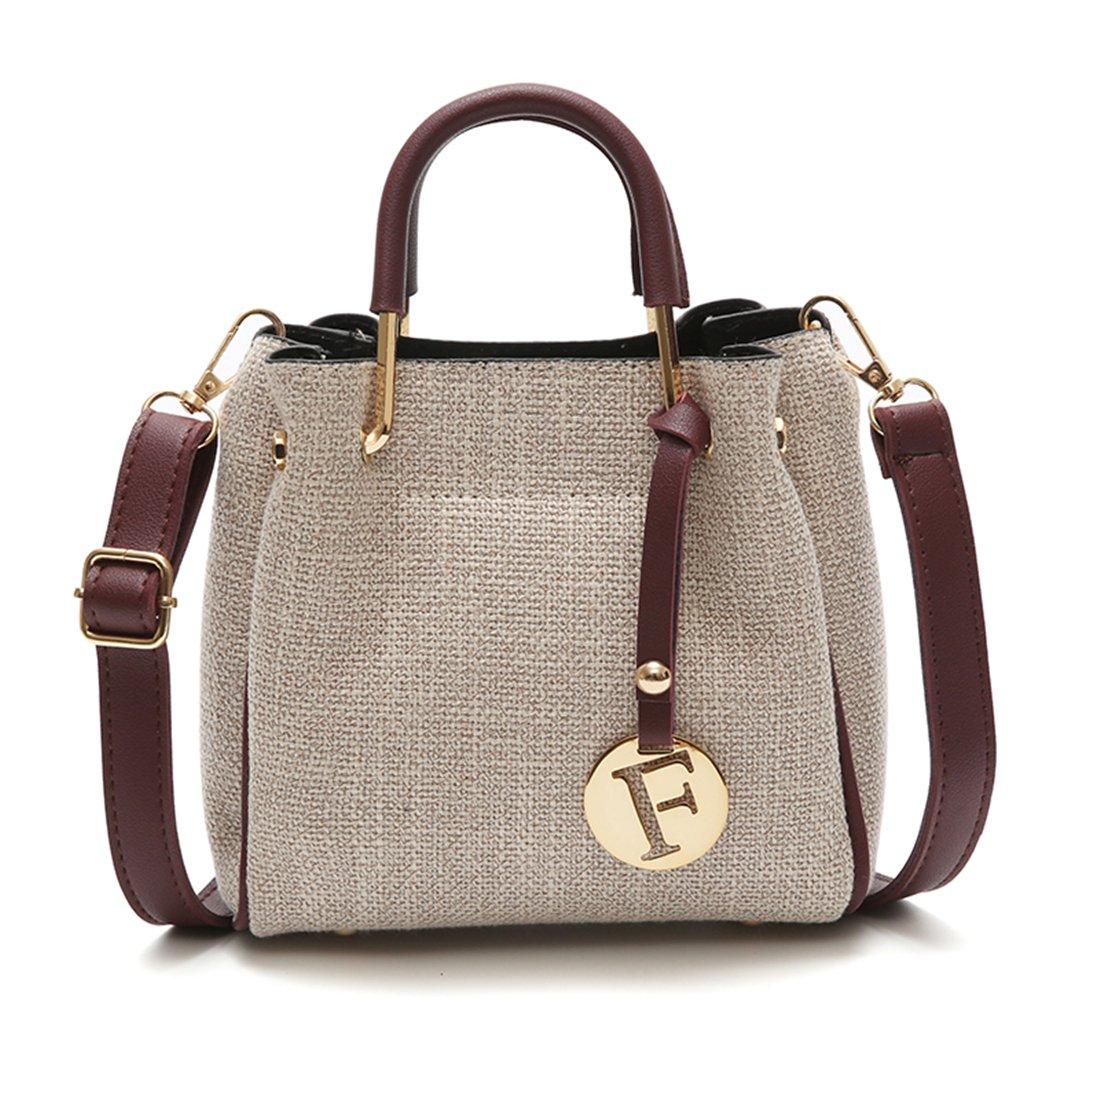 Women's Tote Bags Linen 2 In 1 Handbags Shoulder Bags 2 PCS Satchel Purse(1391Wine Red)